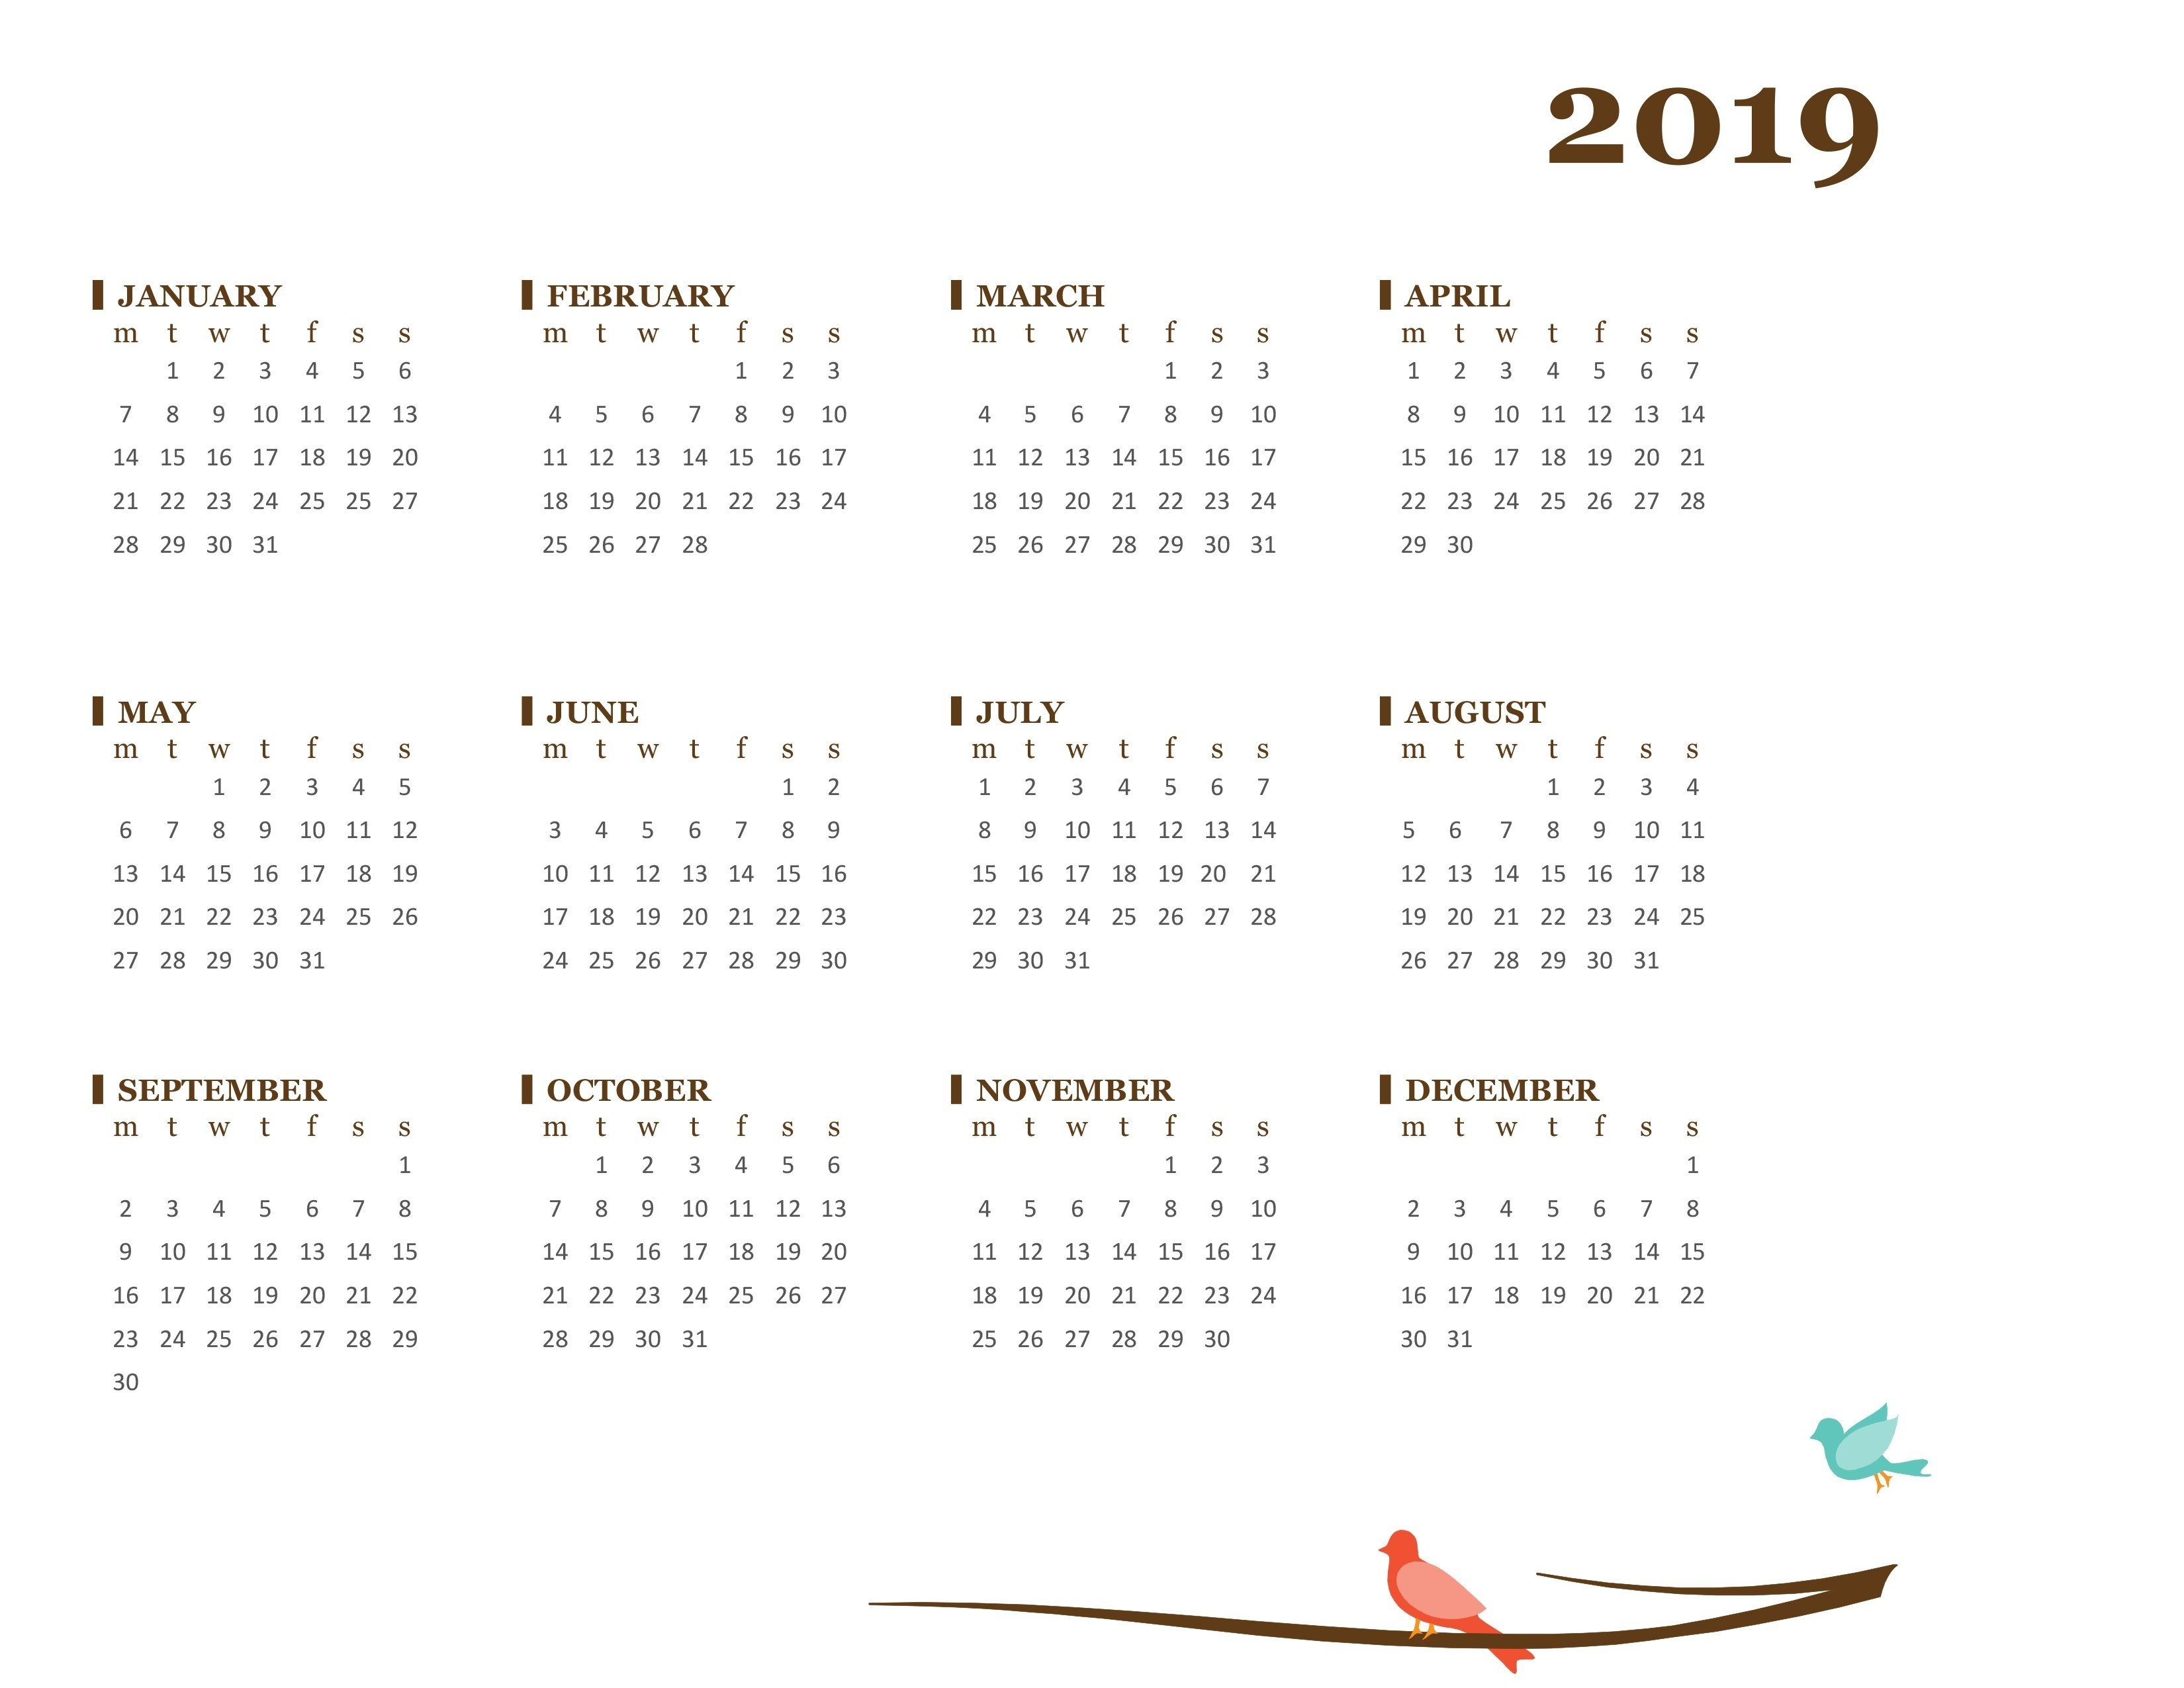 2019 Yearly Calendar (Mon Sun) January 2019 Calendar 365